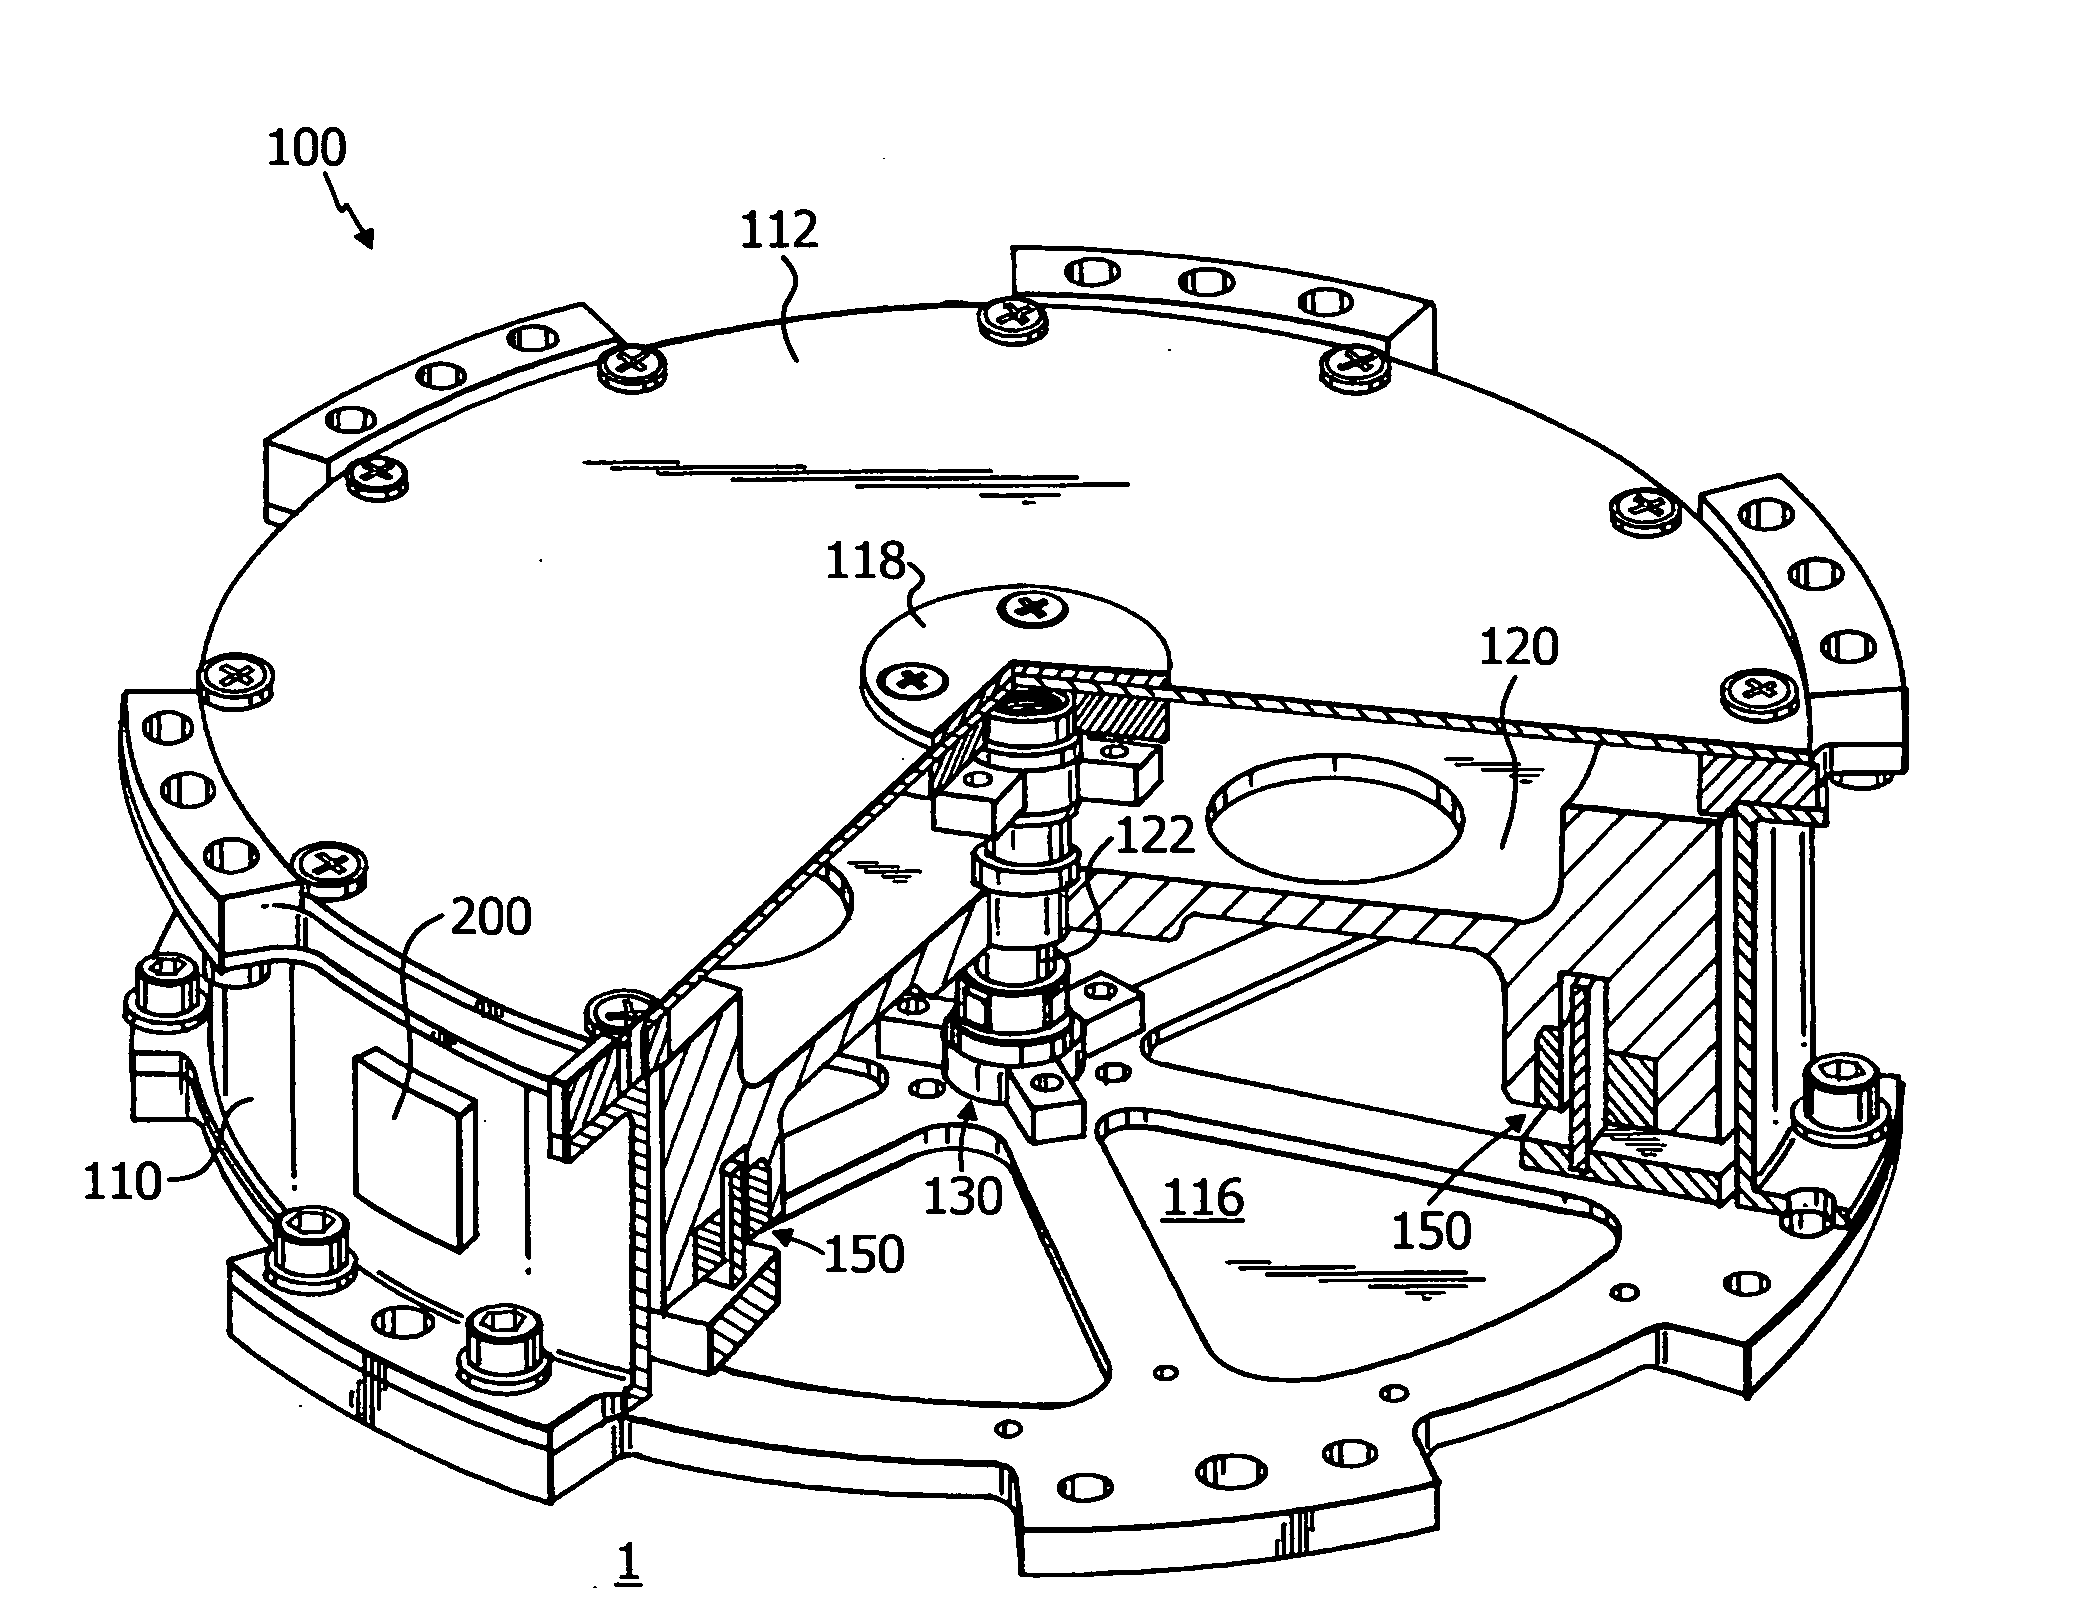 Emerson Microwave Wiring Diagram Diagrams Sunbeam 8991sb Get Free Motor Technologies Electric Motors